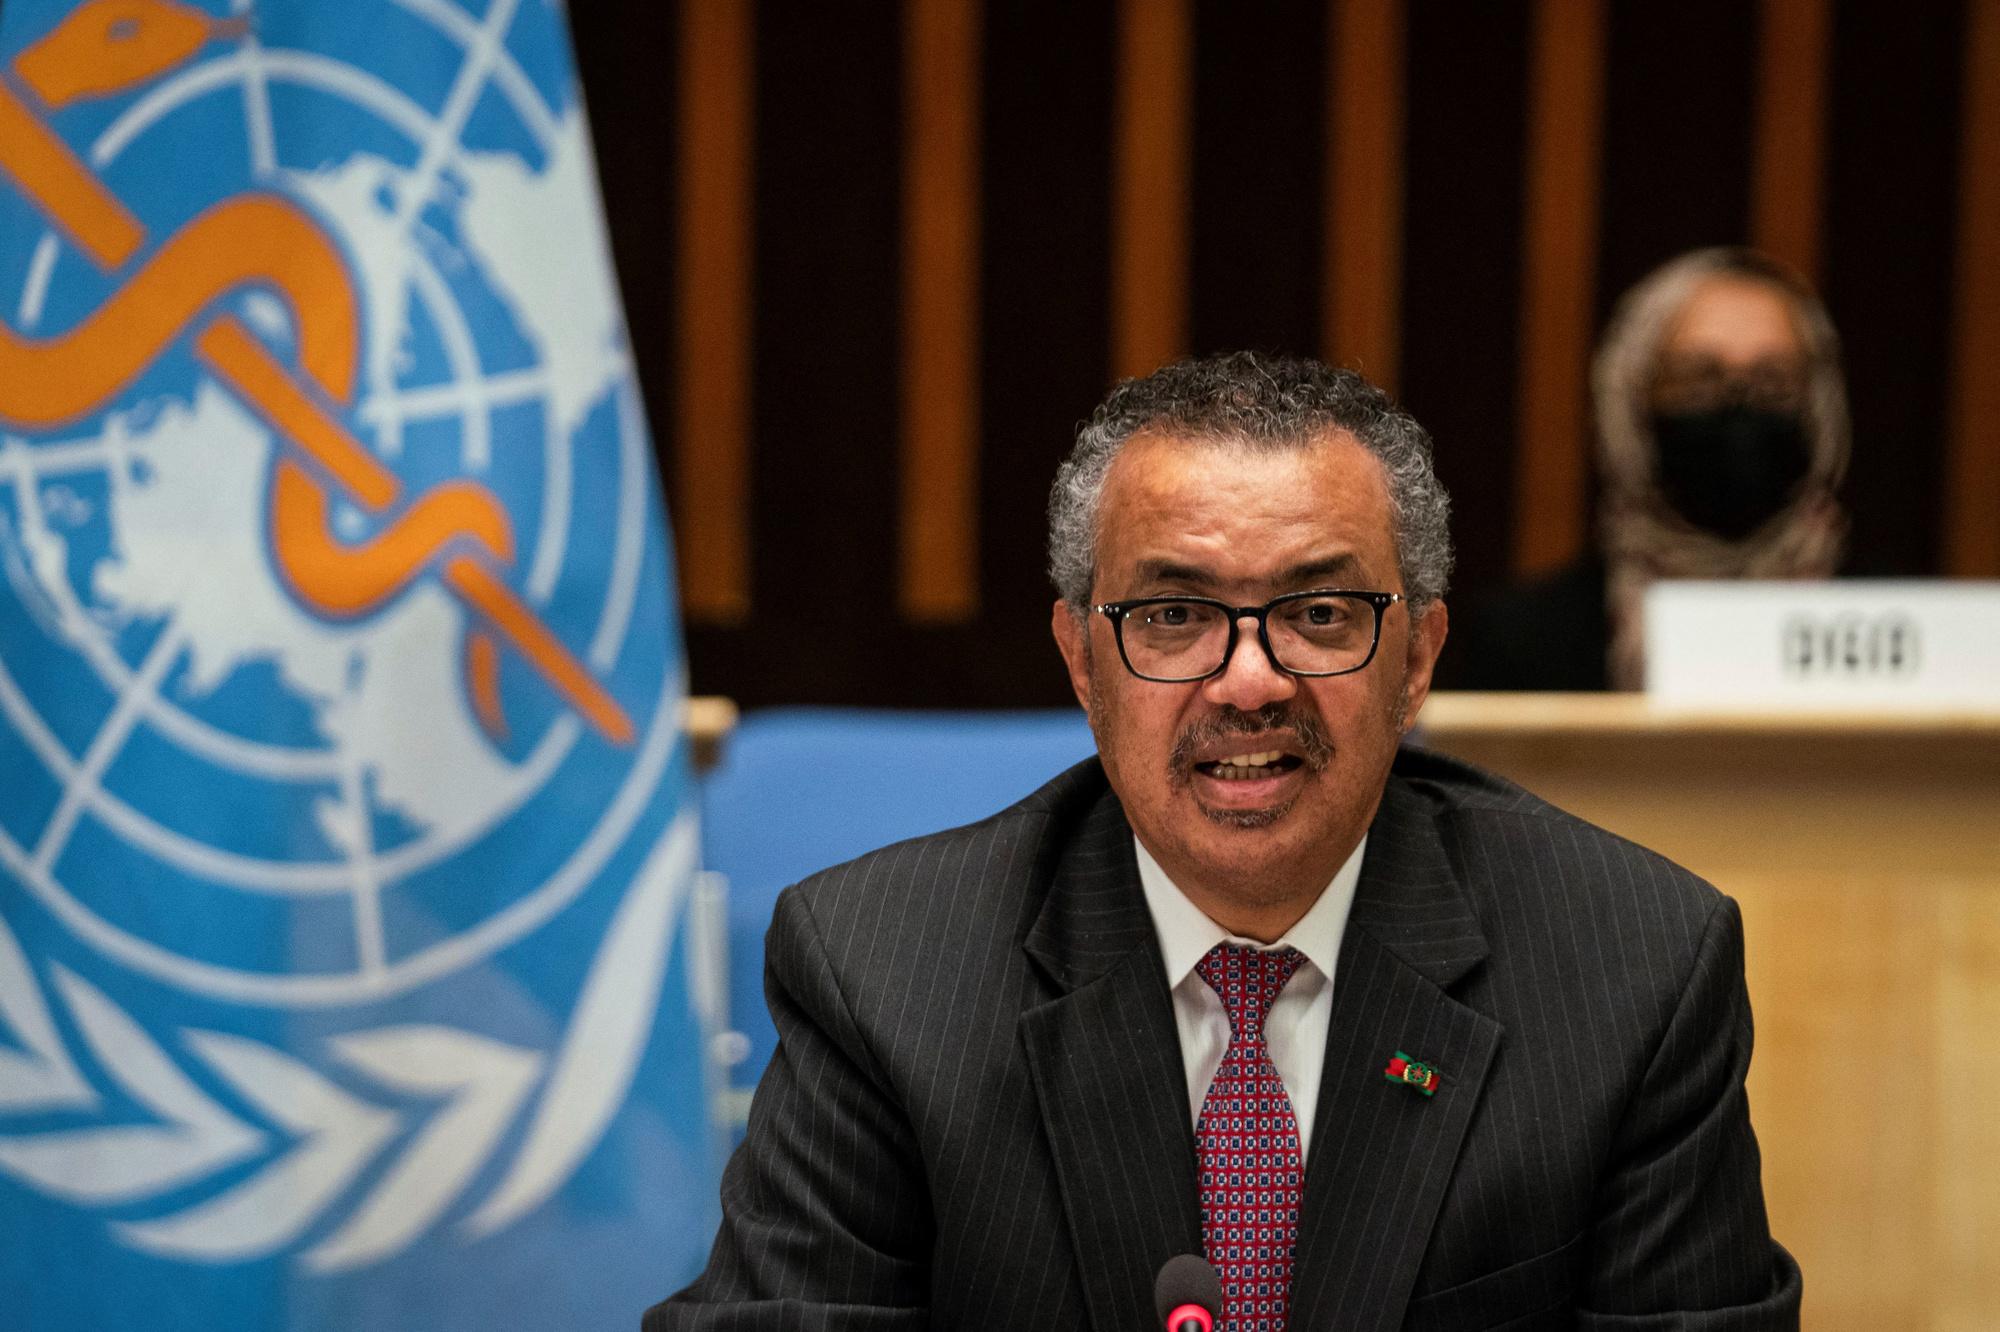 Tedros Adhanom Ghebreyesus, directeur général de l'OMS, Christopher Black / World Health Organization / AFP